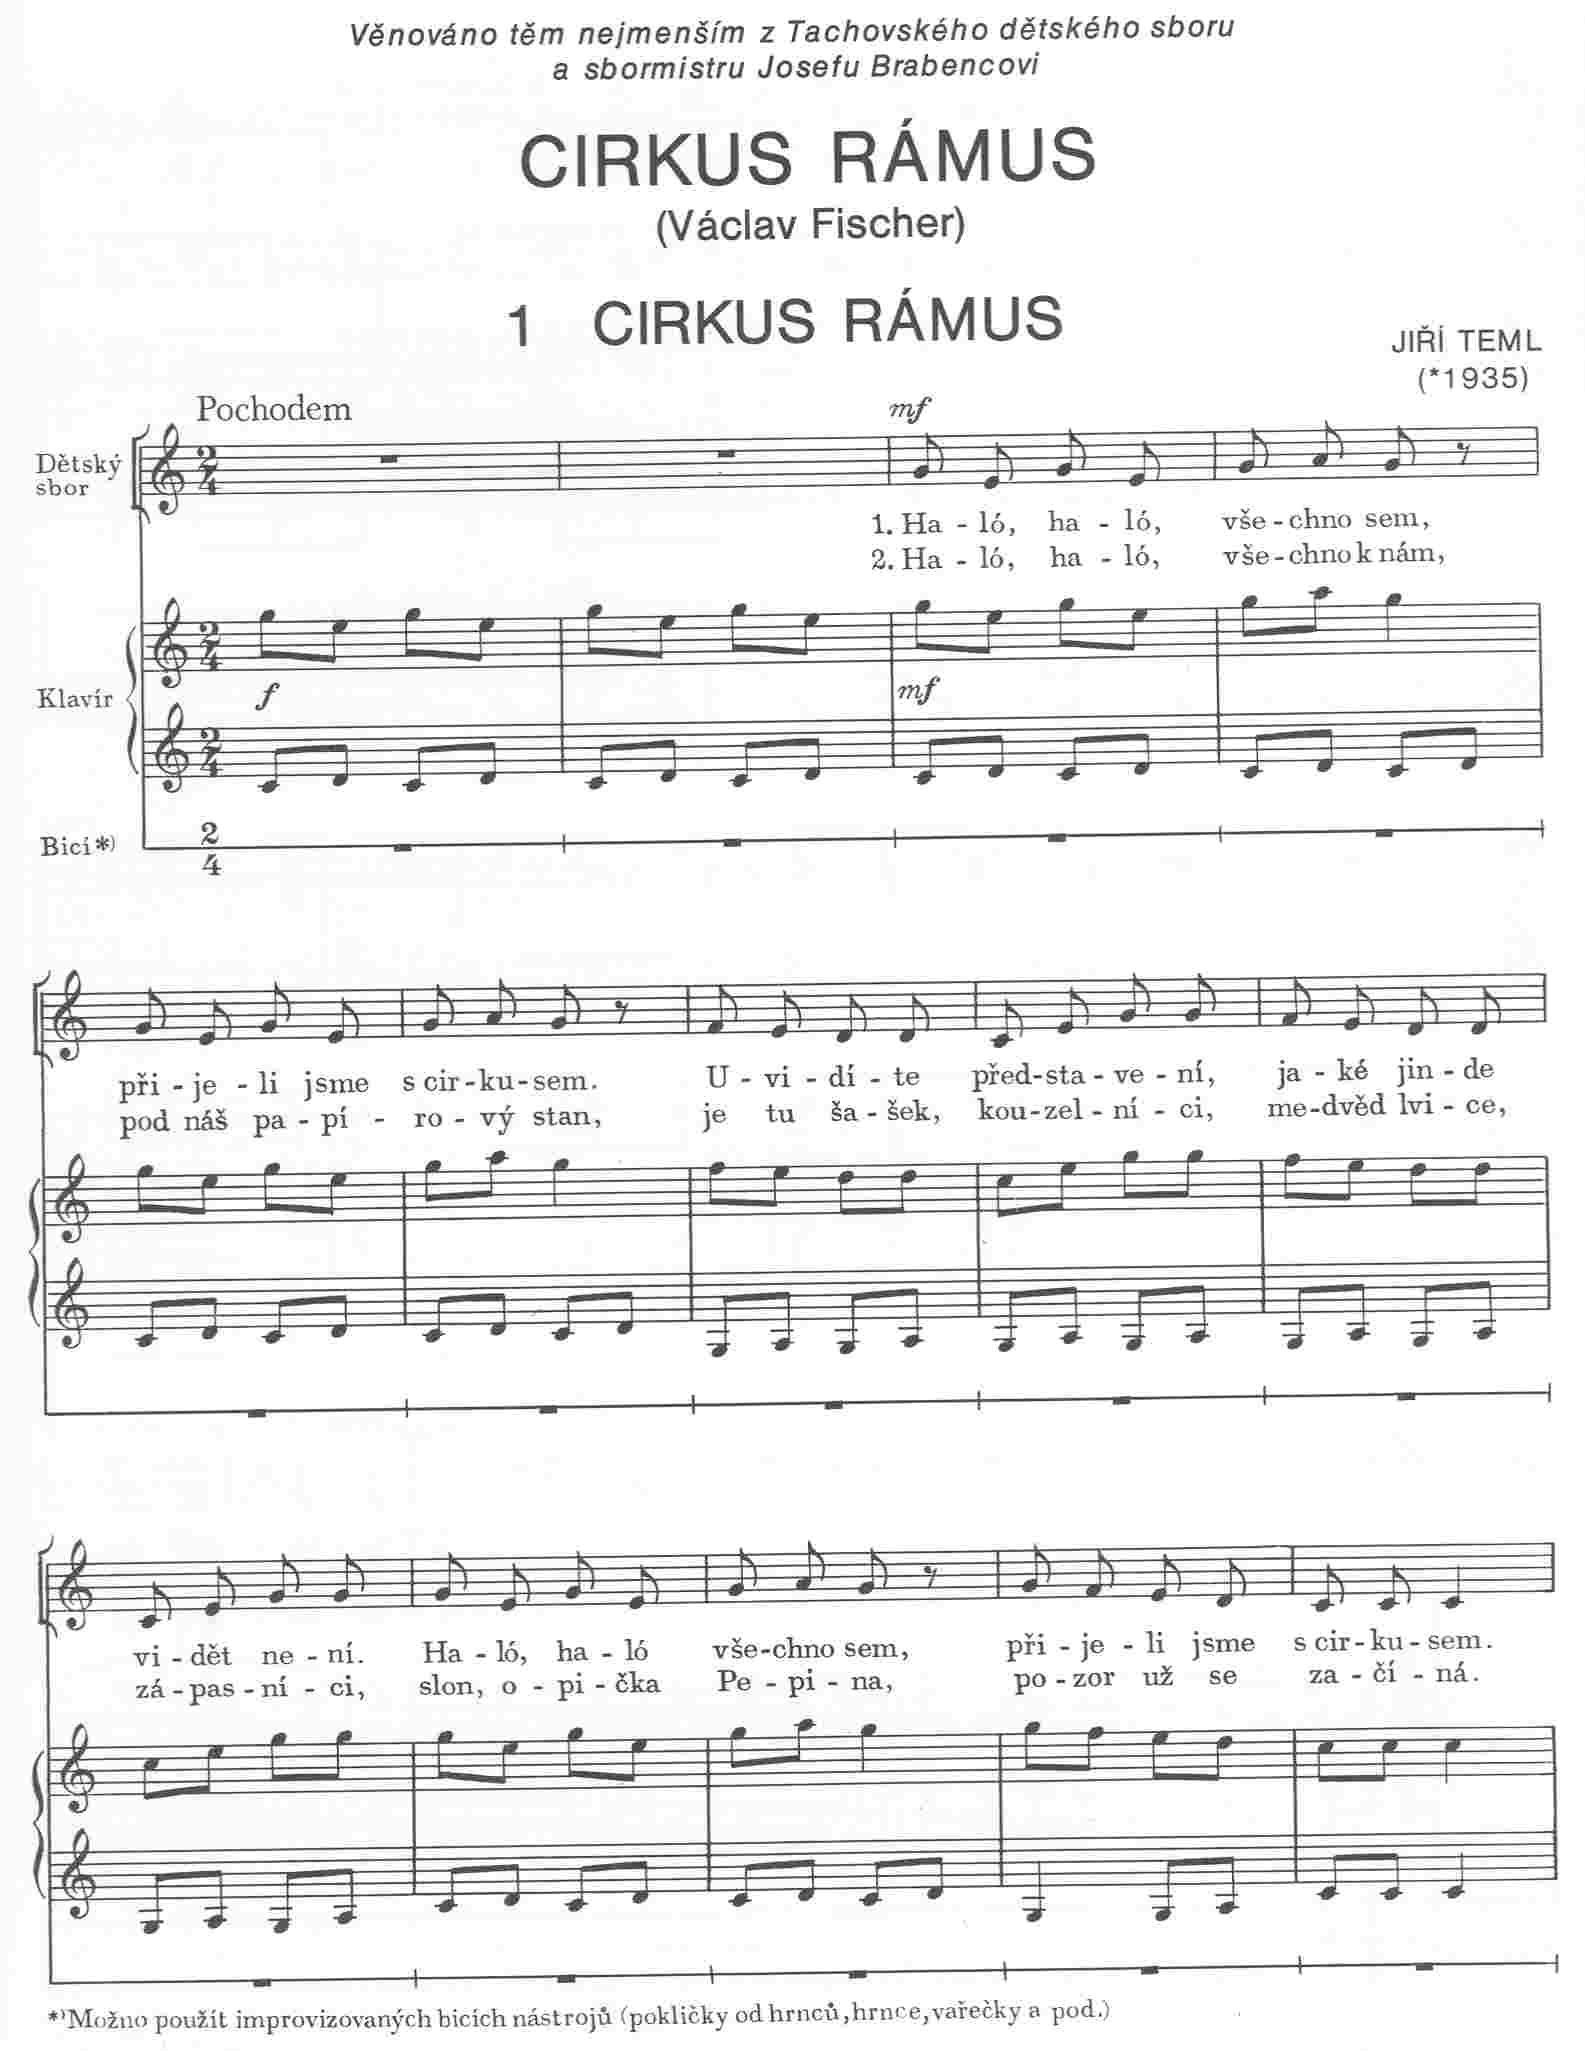 cirkus-ramuskolotoc-pisnicky-pro-detske-sbory-klav eNoty eu